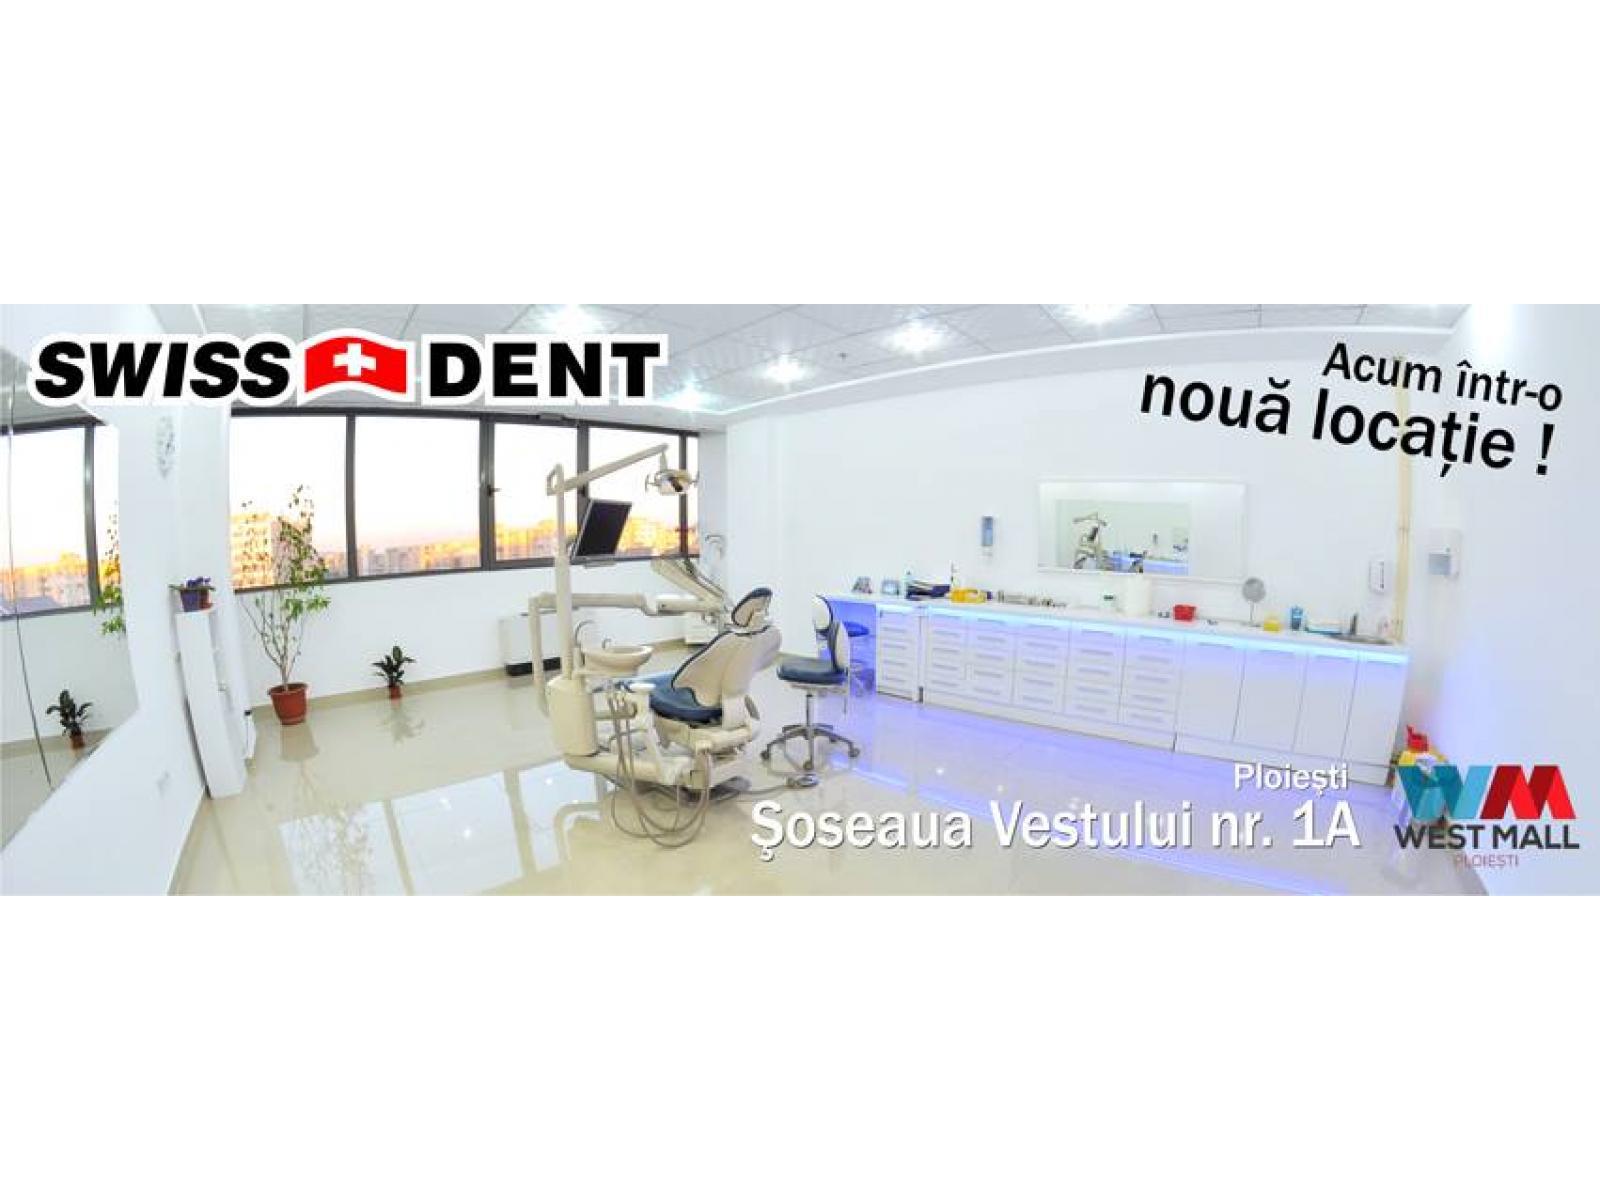 SWISSDENT Dr. Petriu - 10698551_593016770838621_7506616658953666272_n.jpg